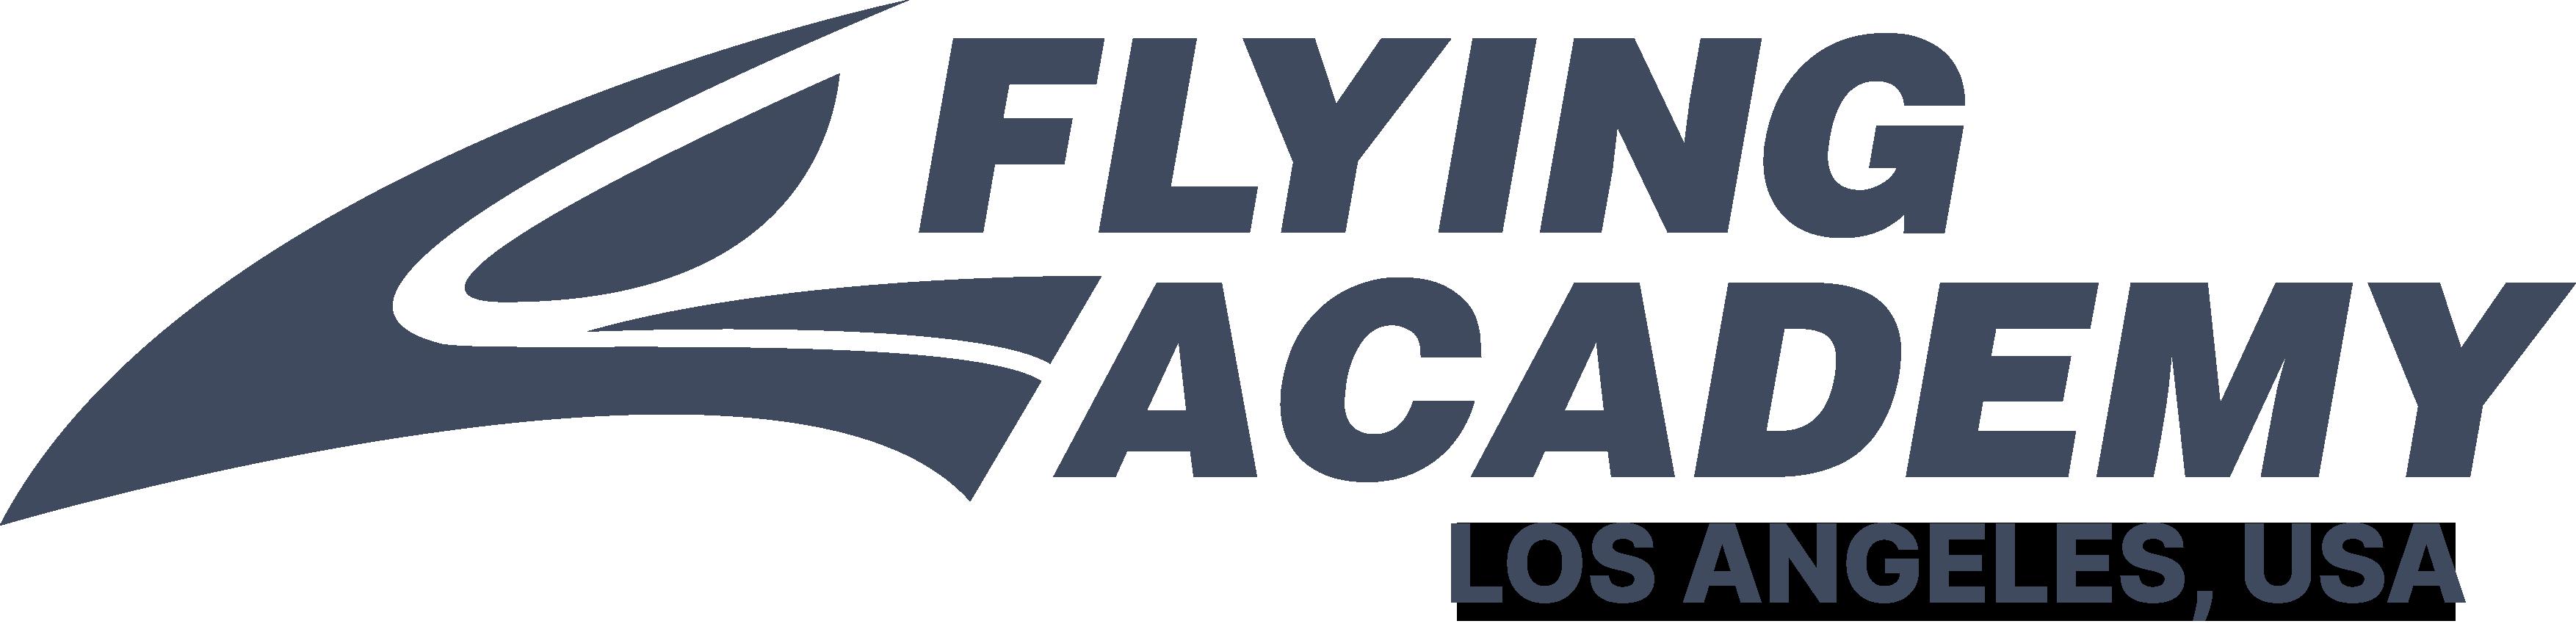 Flying Academy Los Angeles | Professional Pilot Training